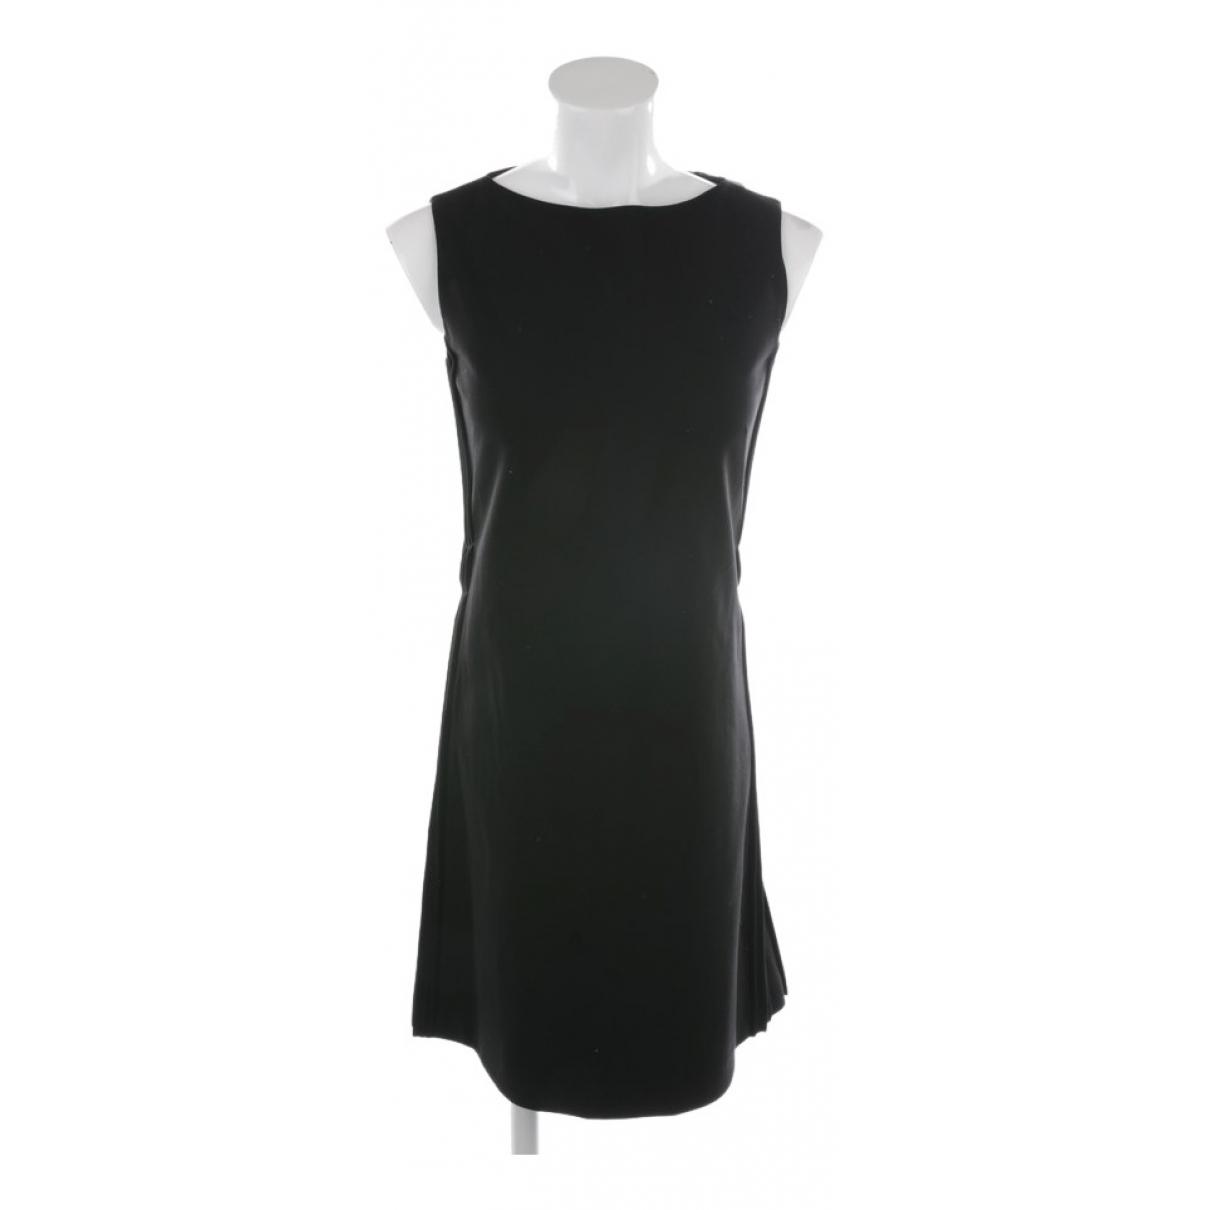 Dorothee Schumacher \N Black Cotton dress for Women 34 FR